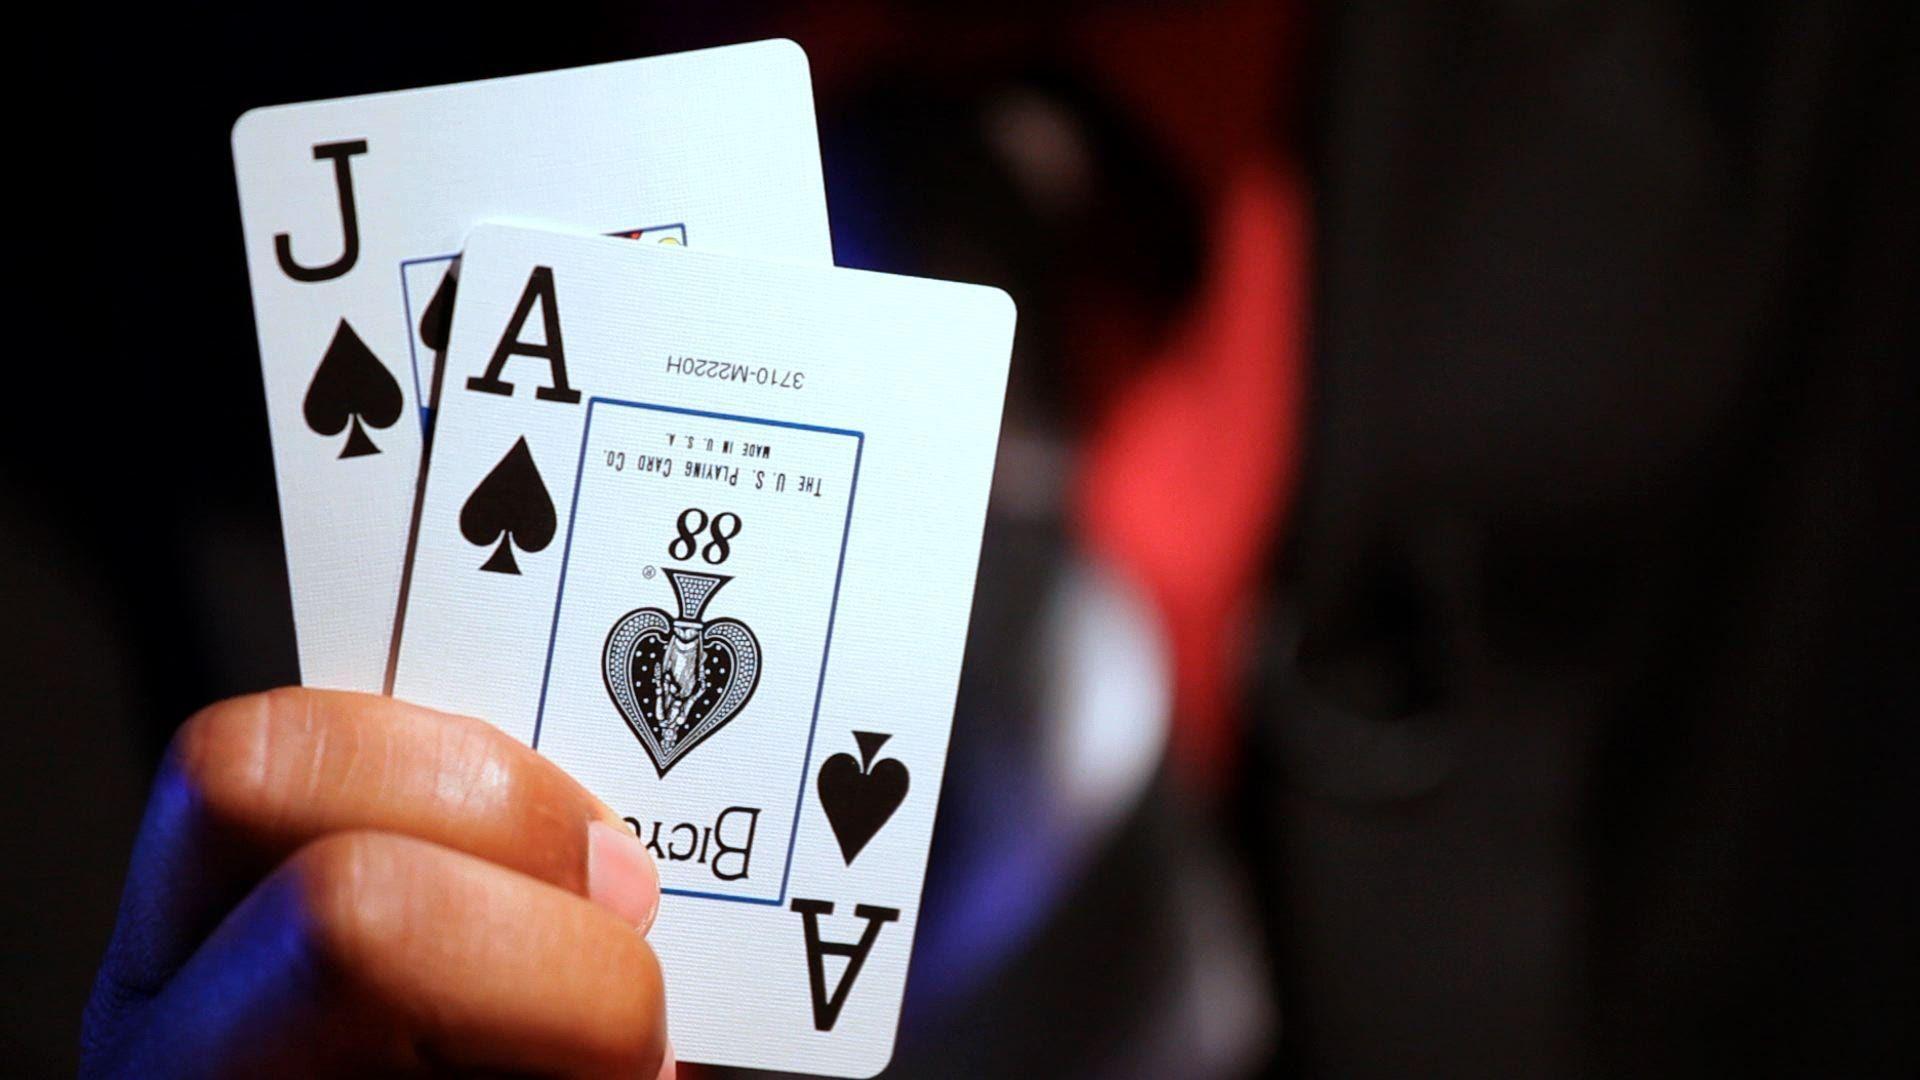 10 free hands of blackjack with Paf